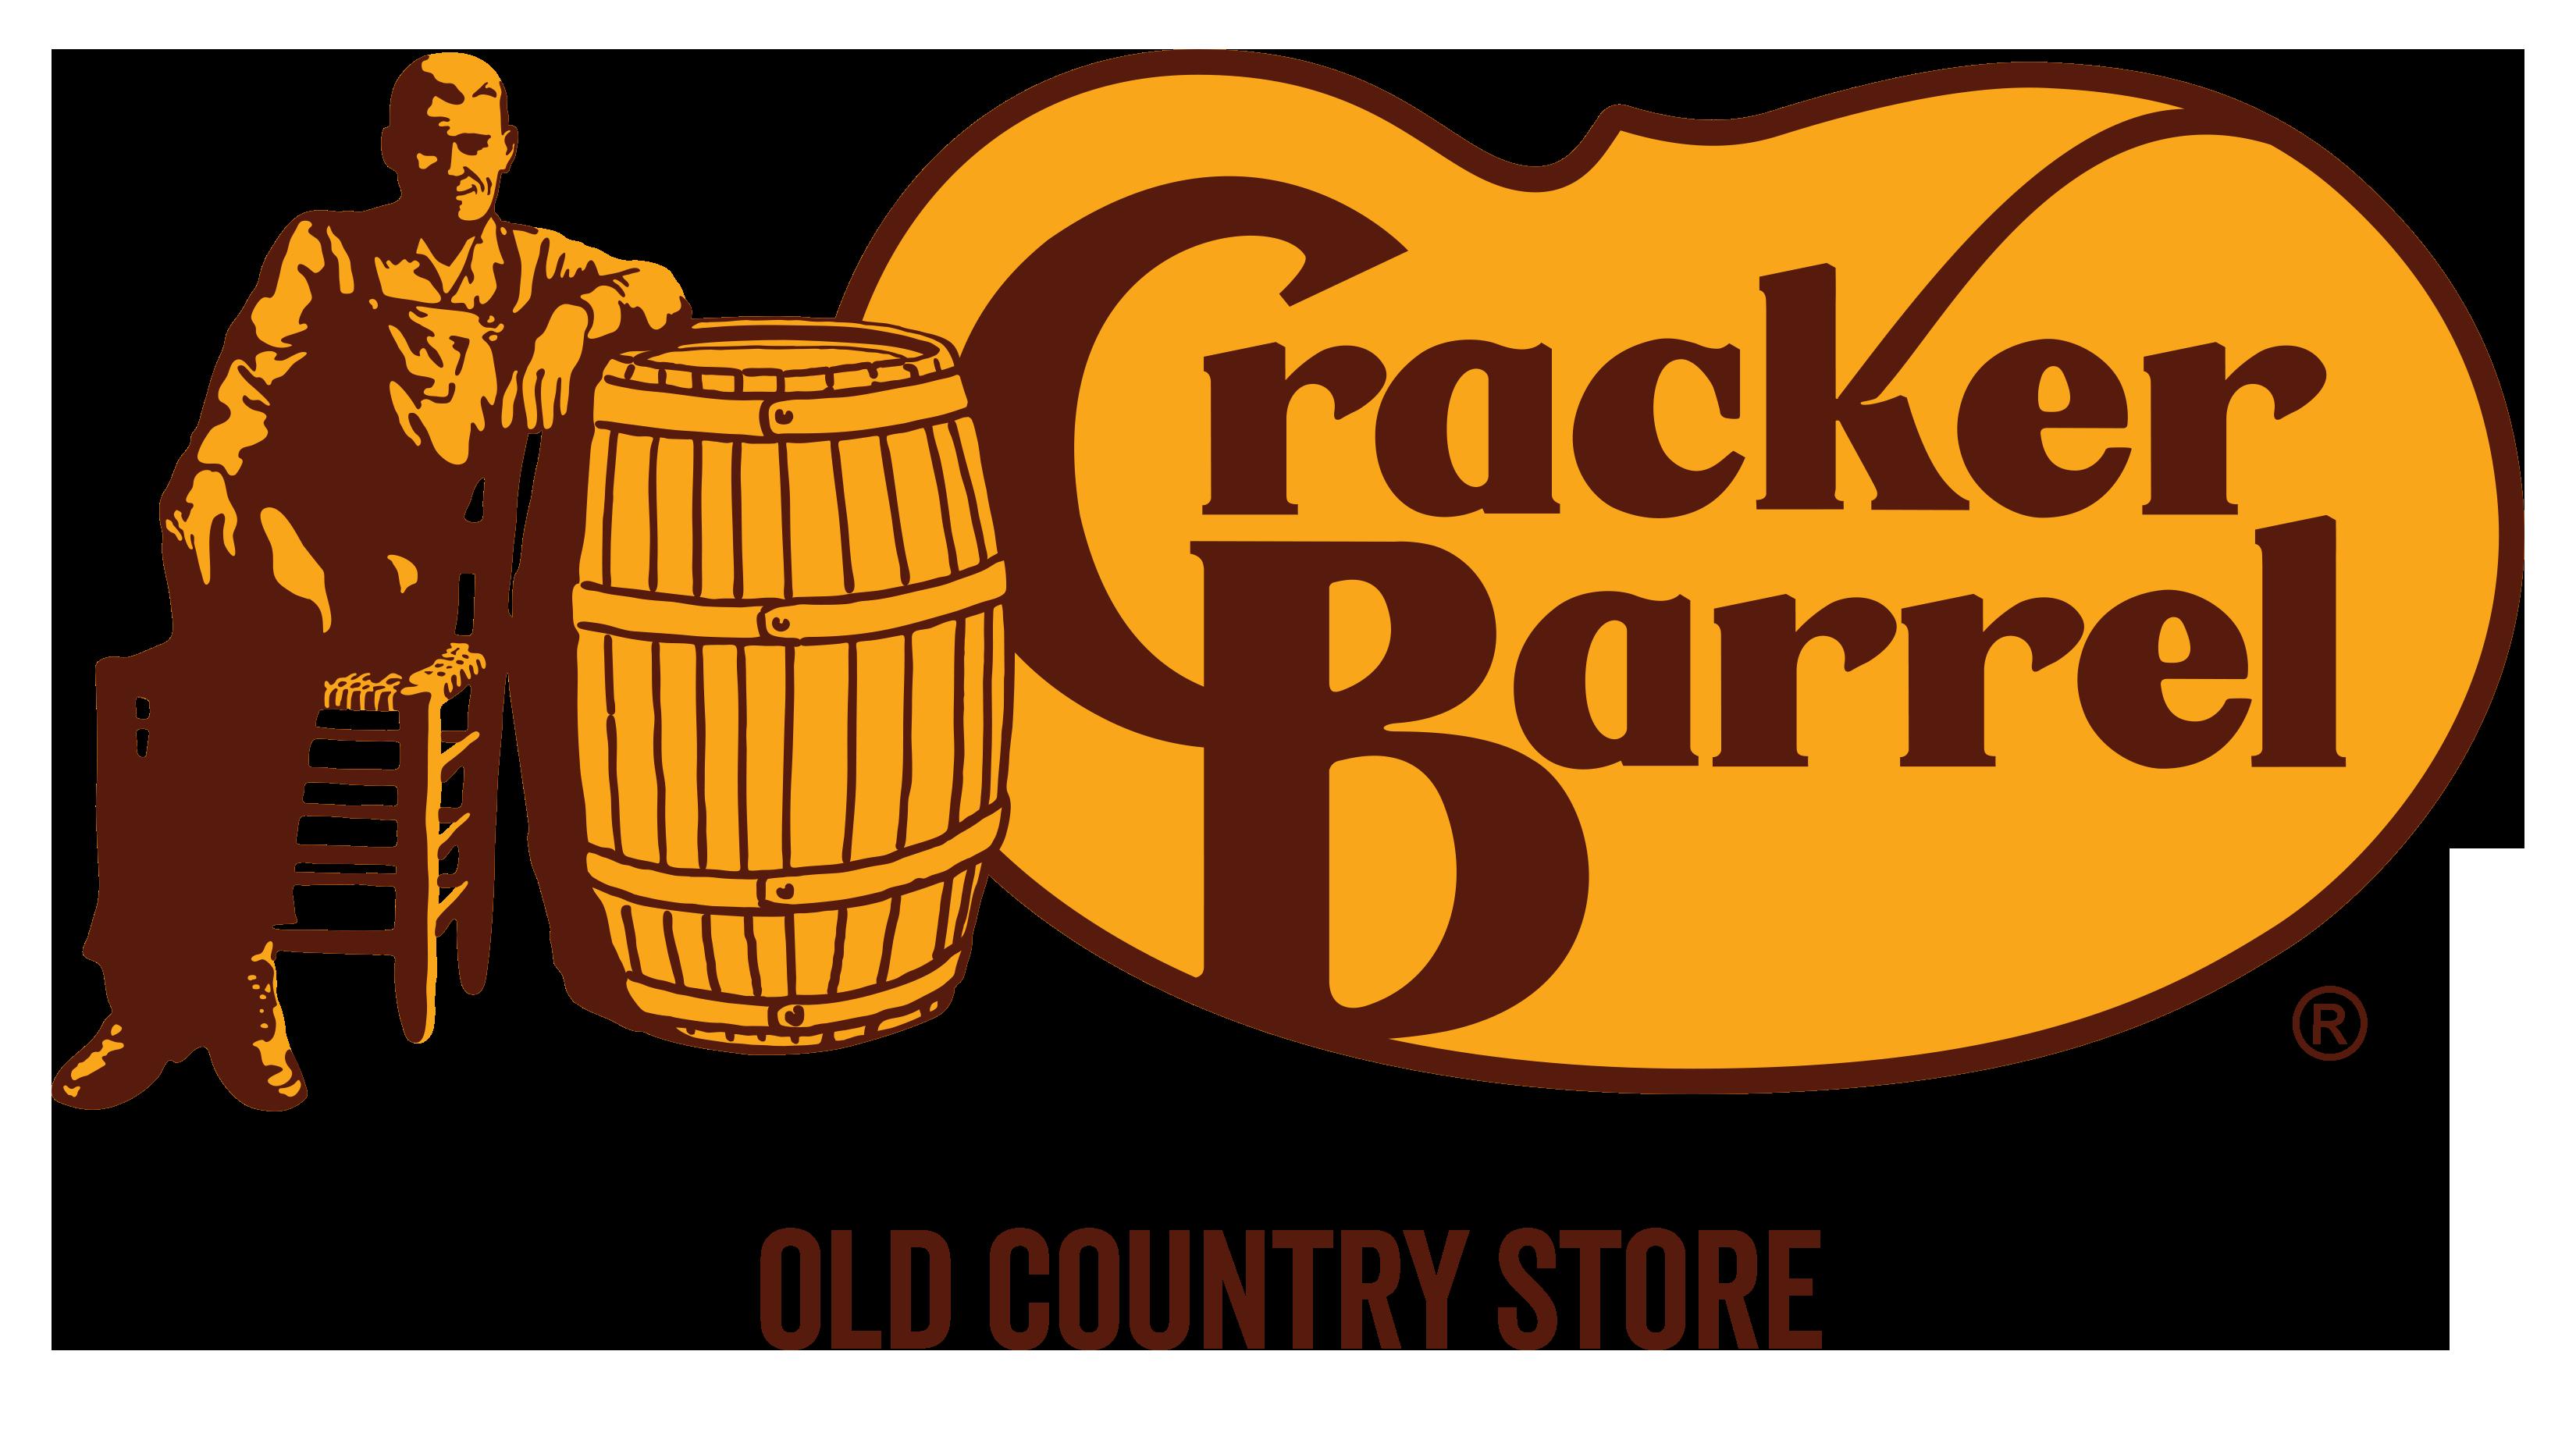 1_cracker_barrel_logo_